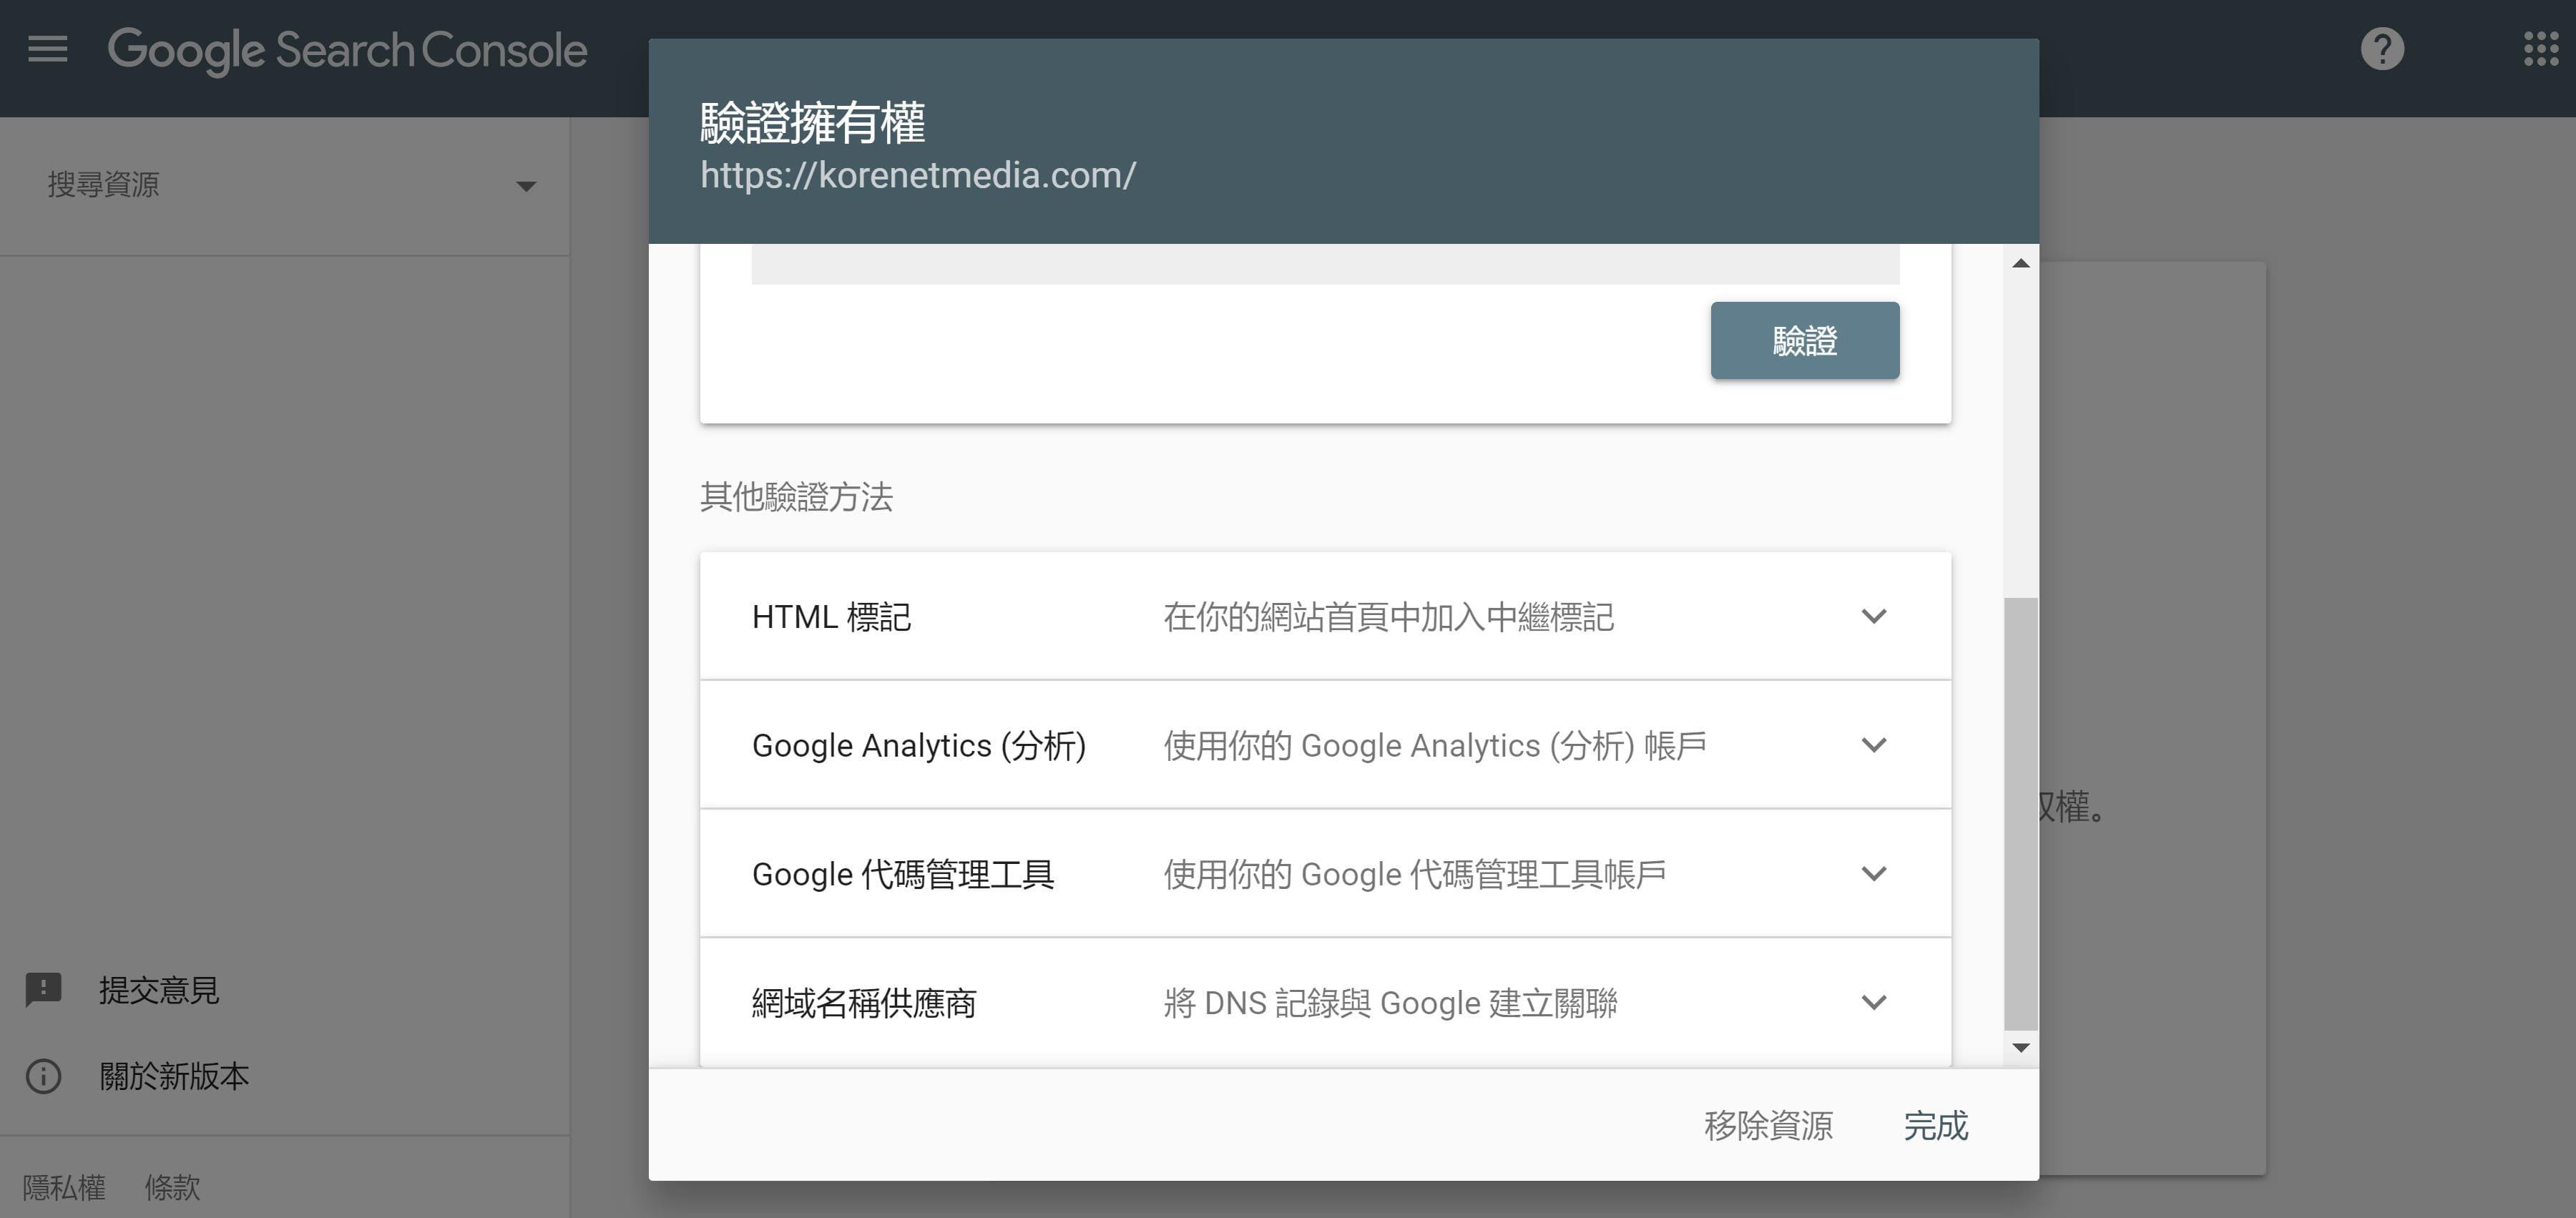 Google Search Console驗證